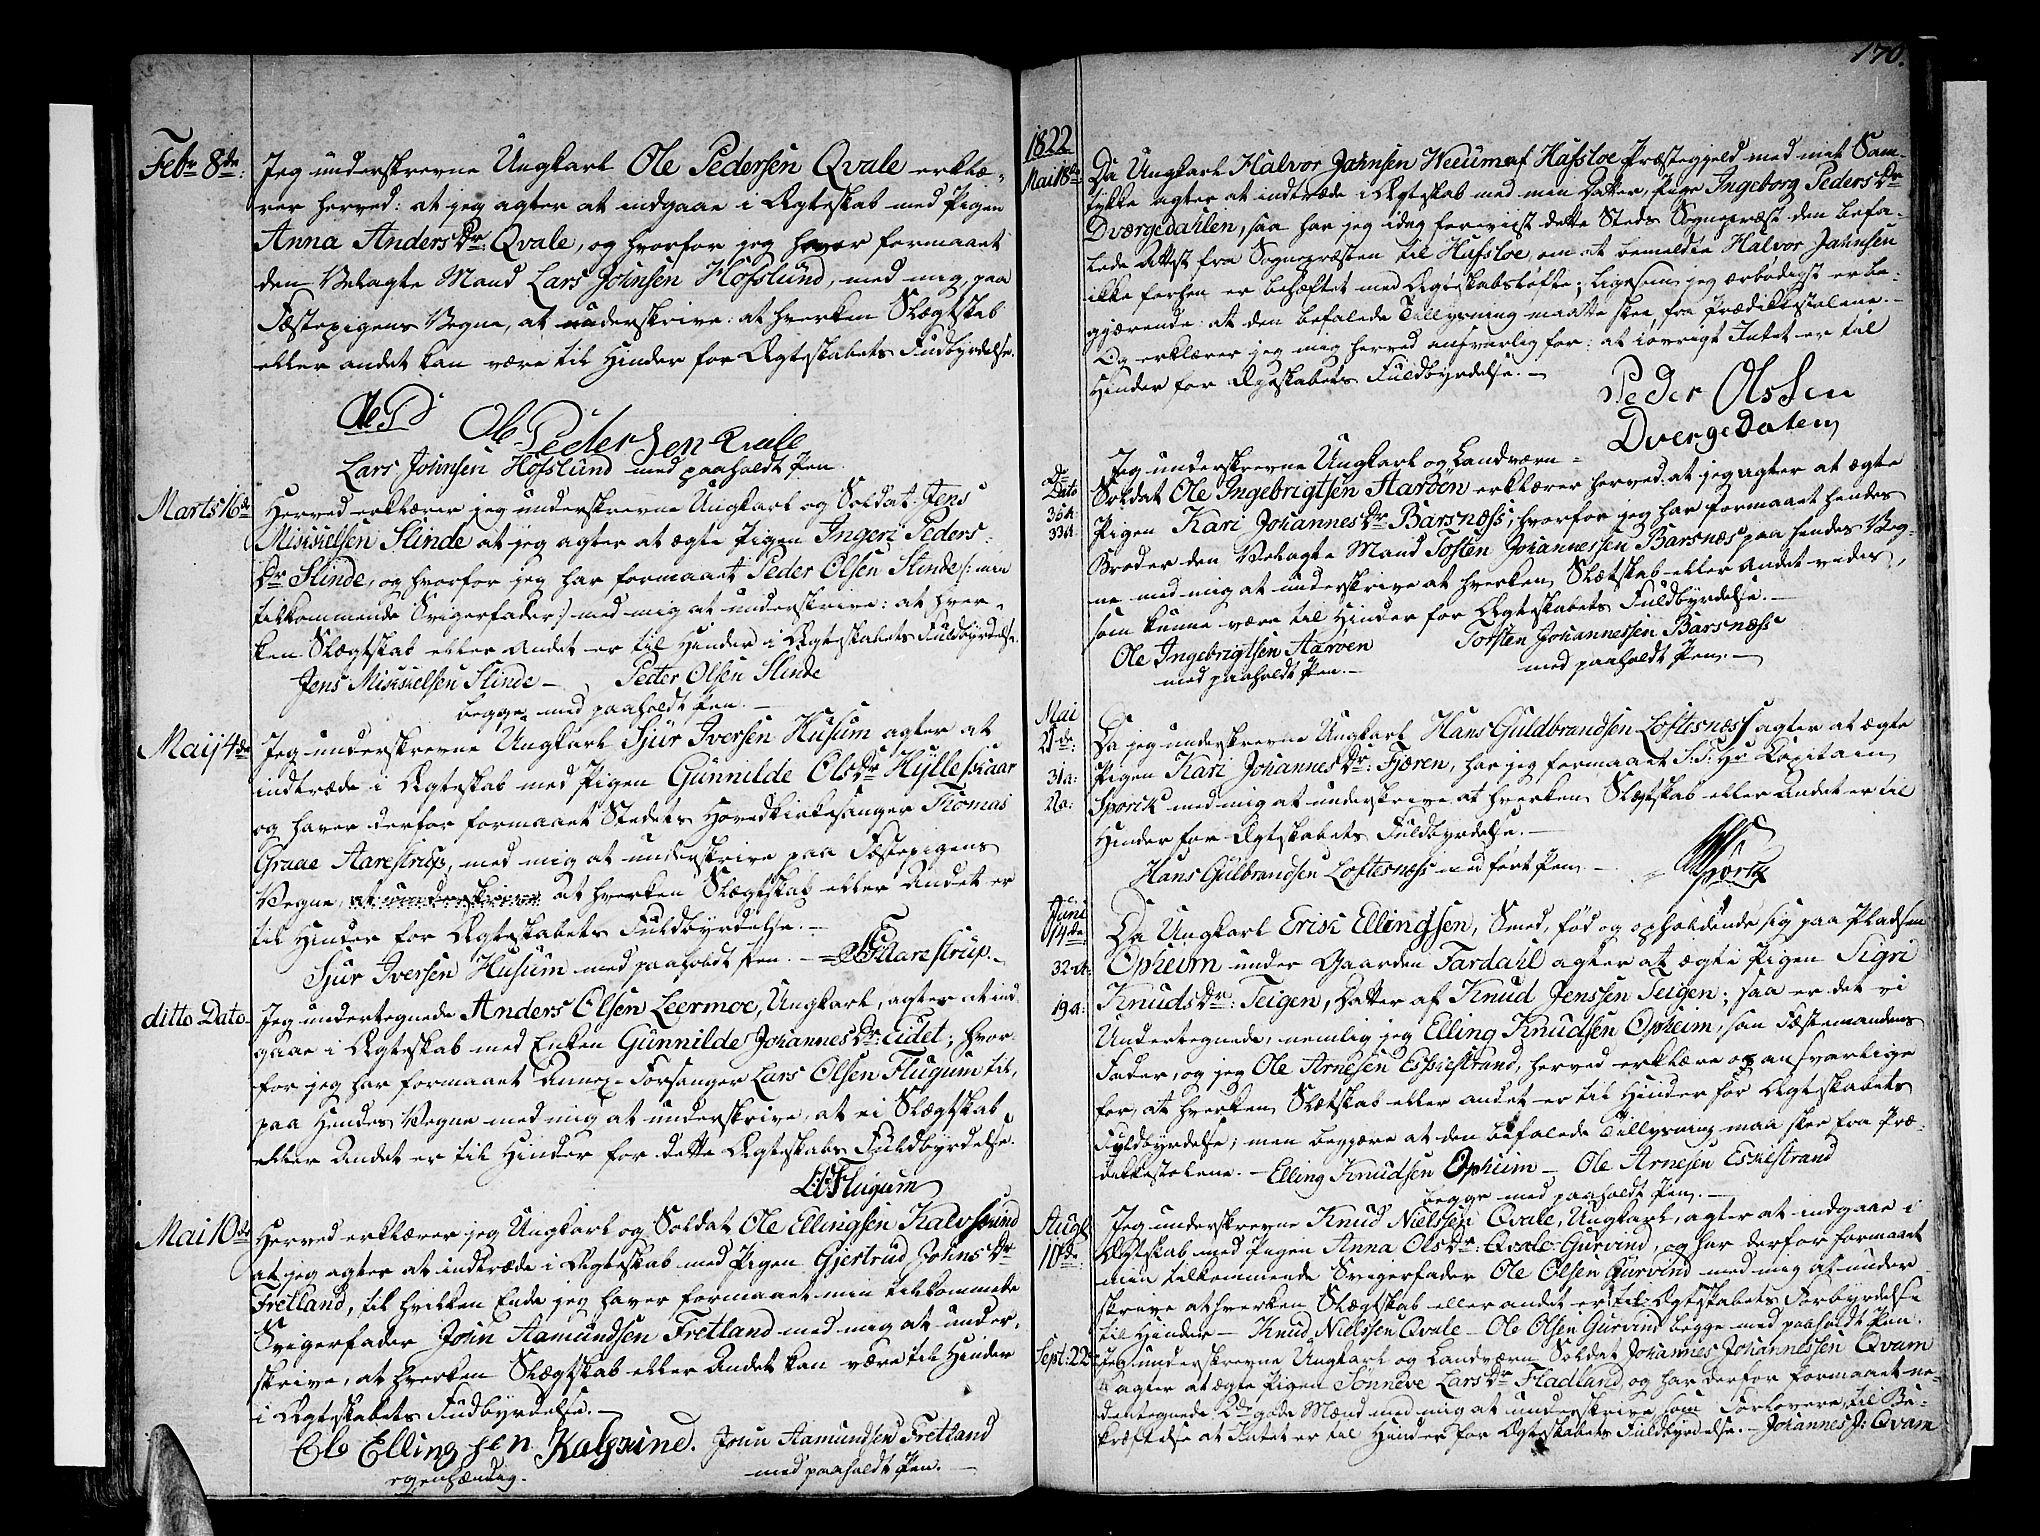 SAB, Sogndal Sokneprestembete, H/Haa/Haaa/L0009: Ministerialbok nr. A 9, 1809-1821, s. 170